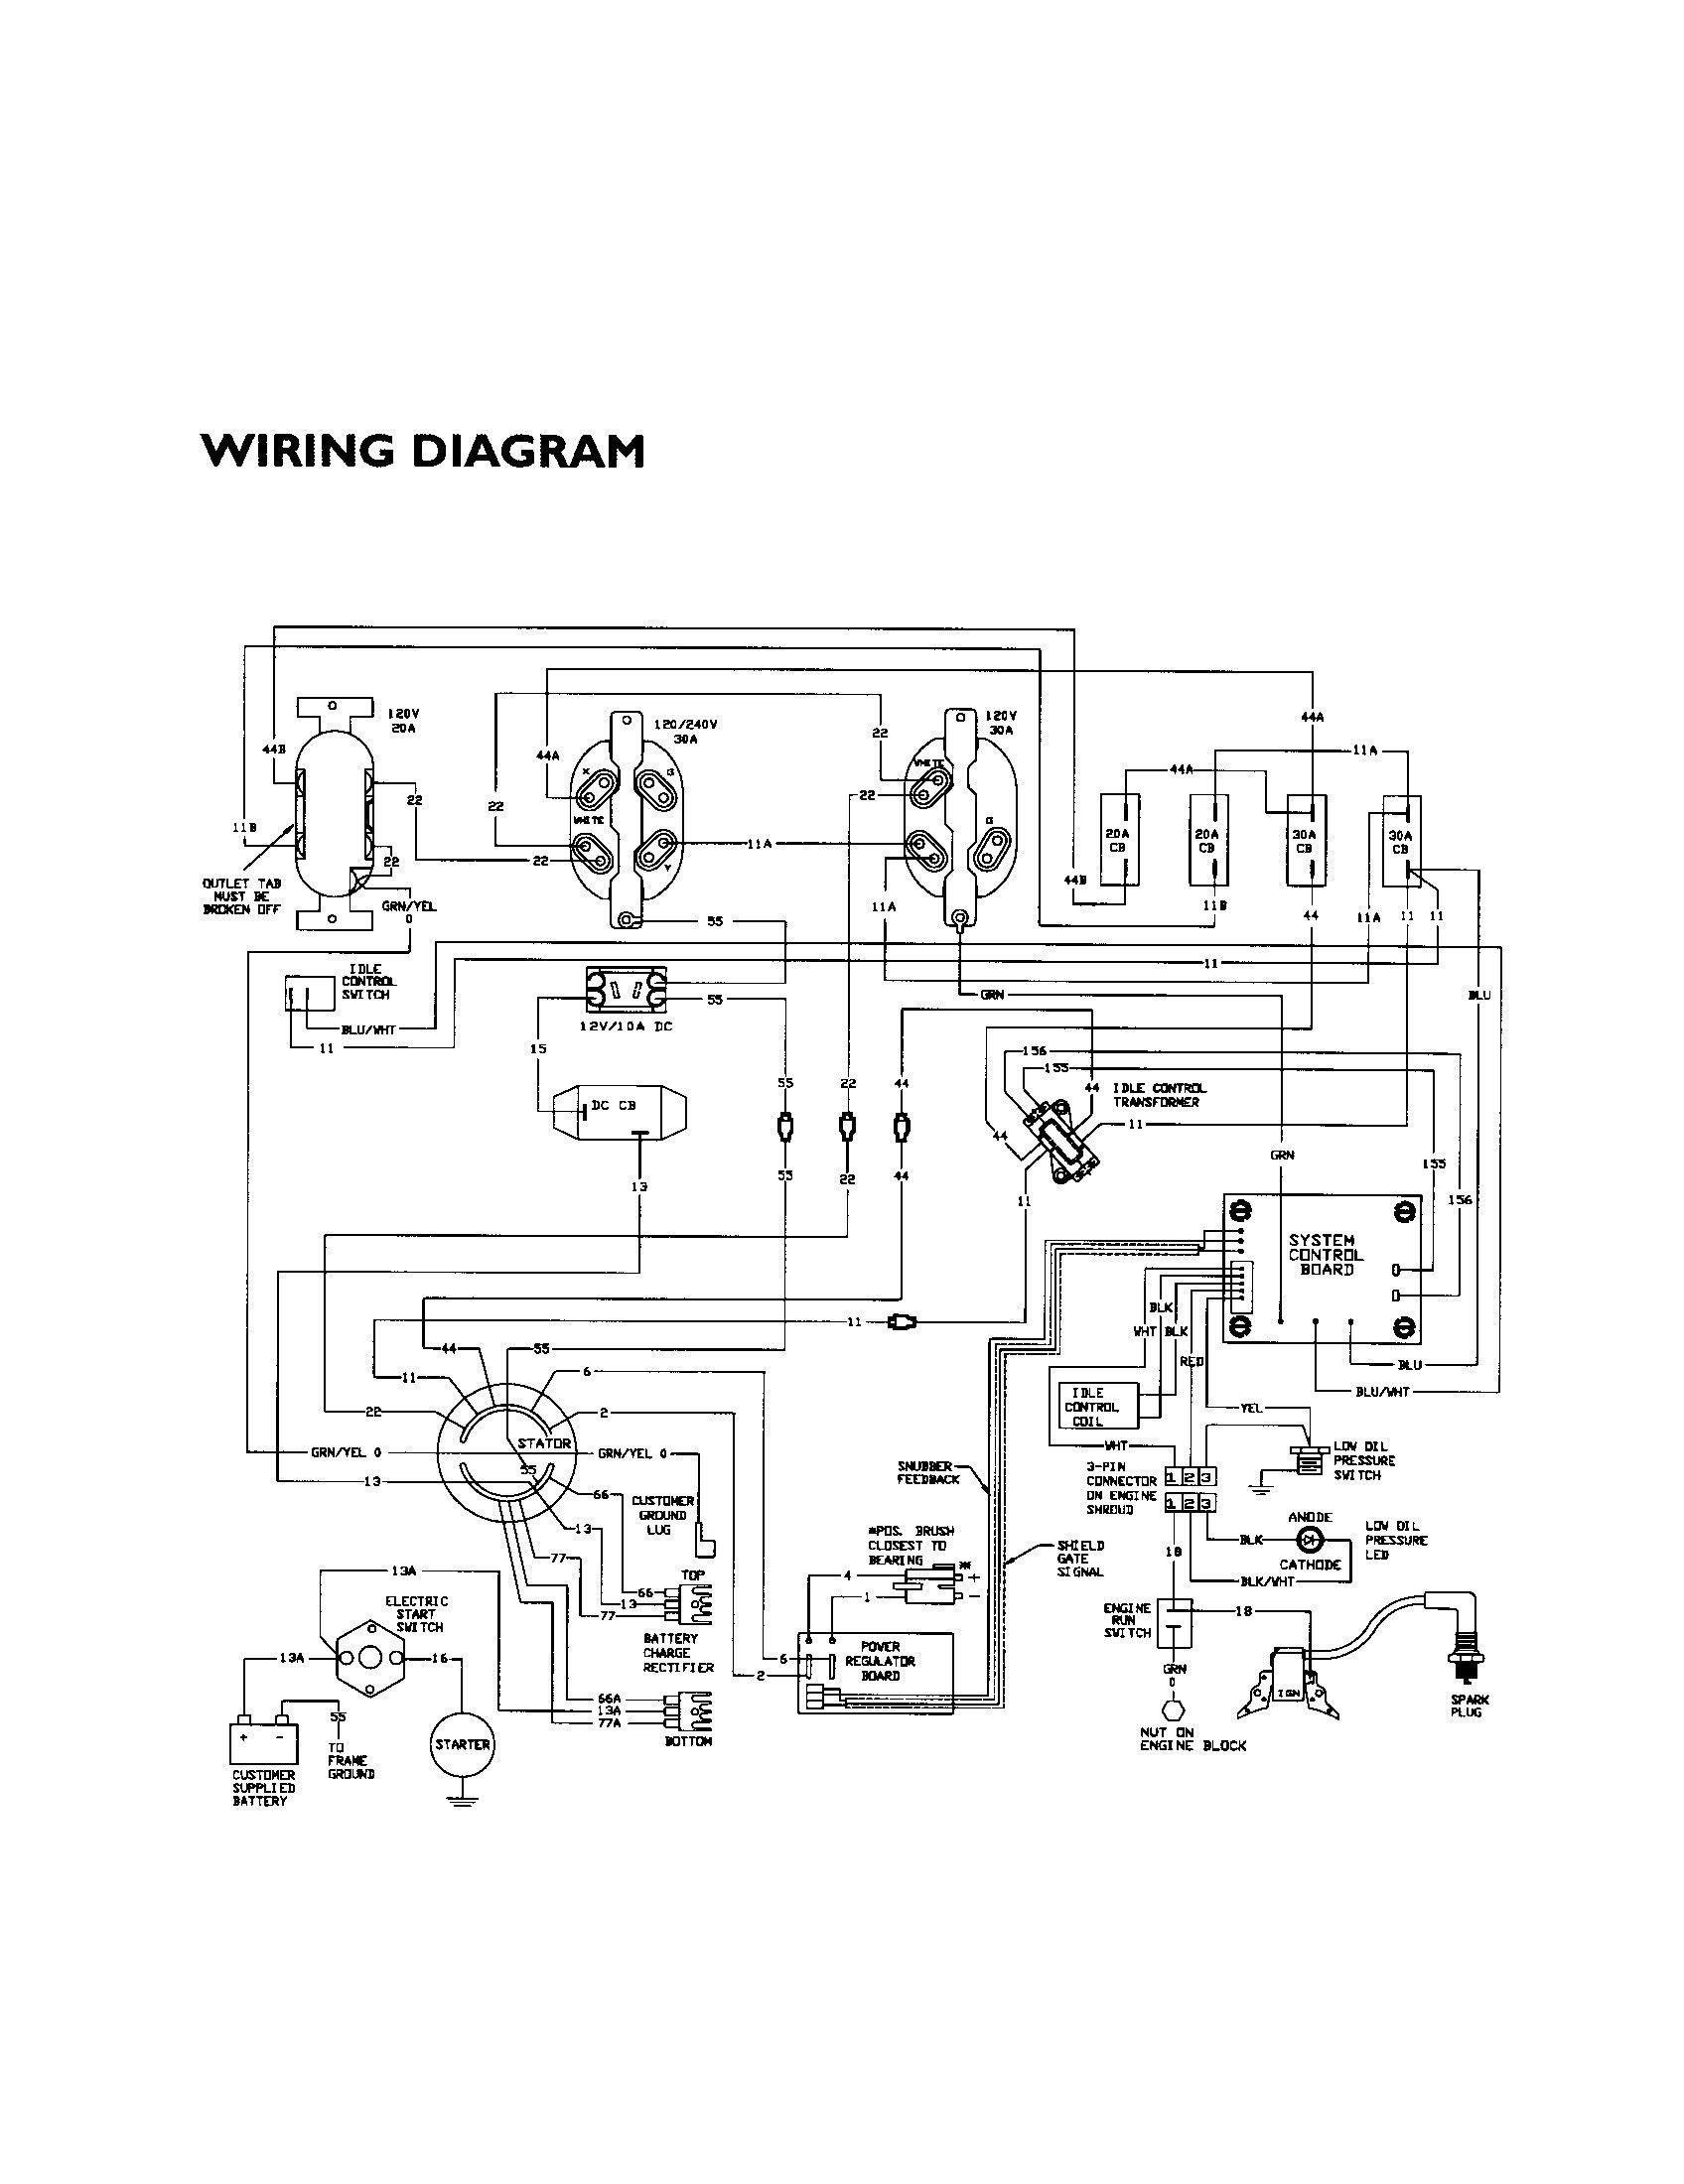 Automatic Transfer Switch Wiring Diagram Free In 2021 Generator Transfer Switch Circuit Diagram Wiring Diagram